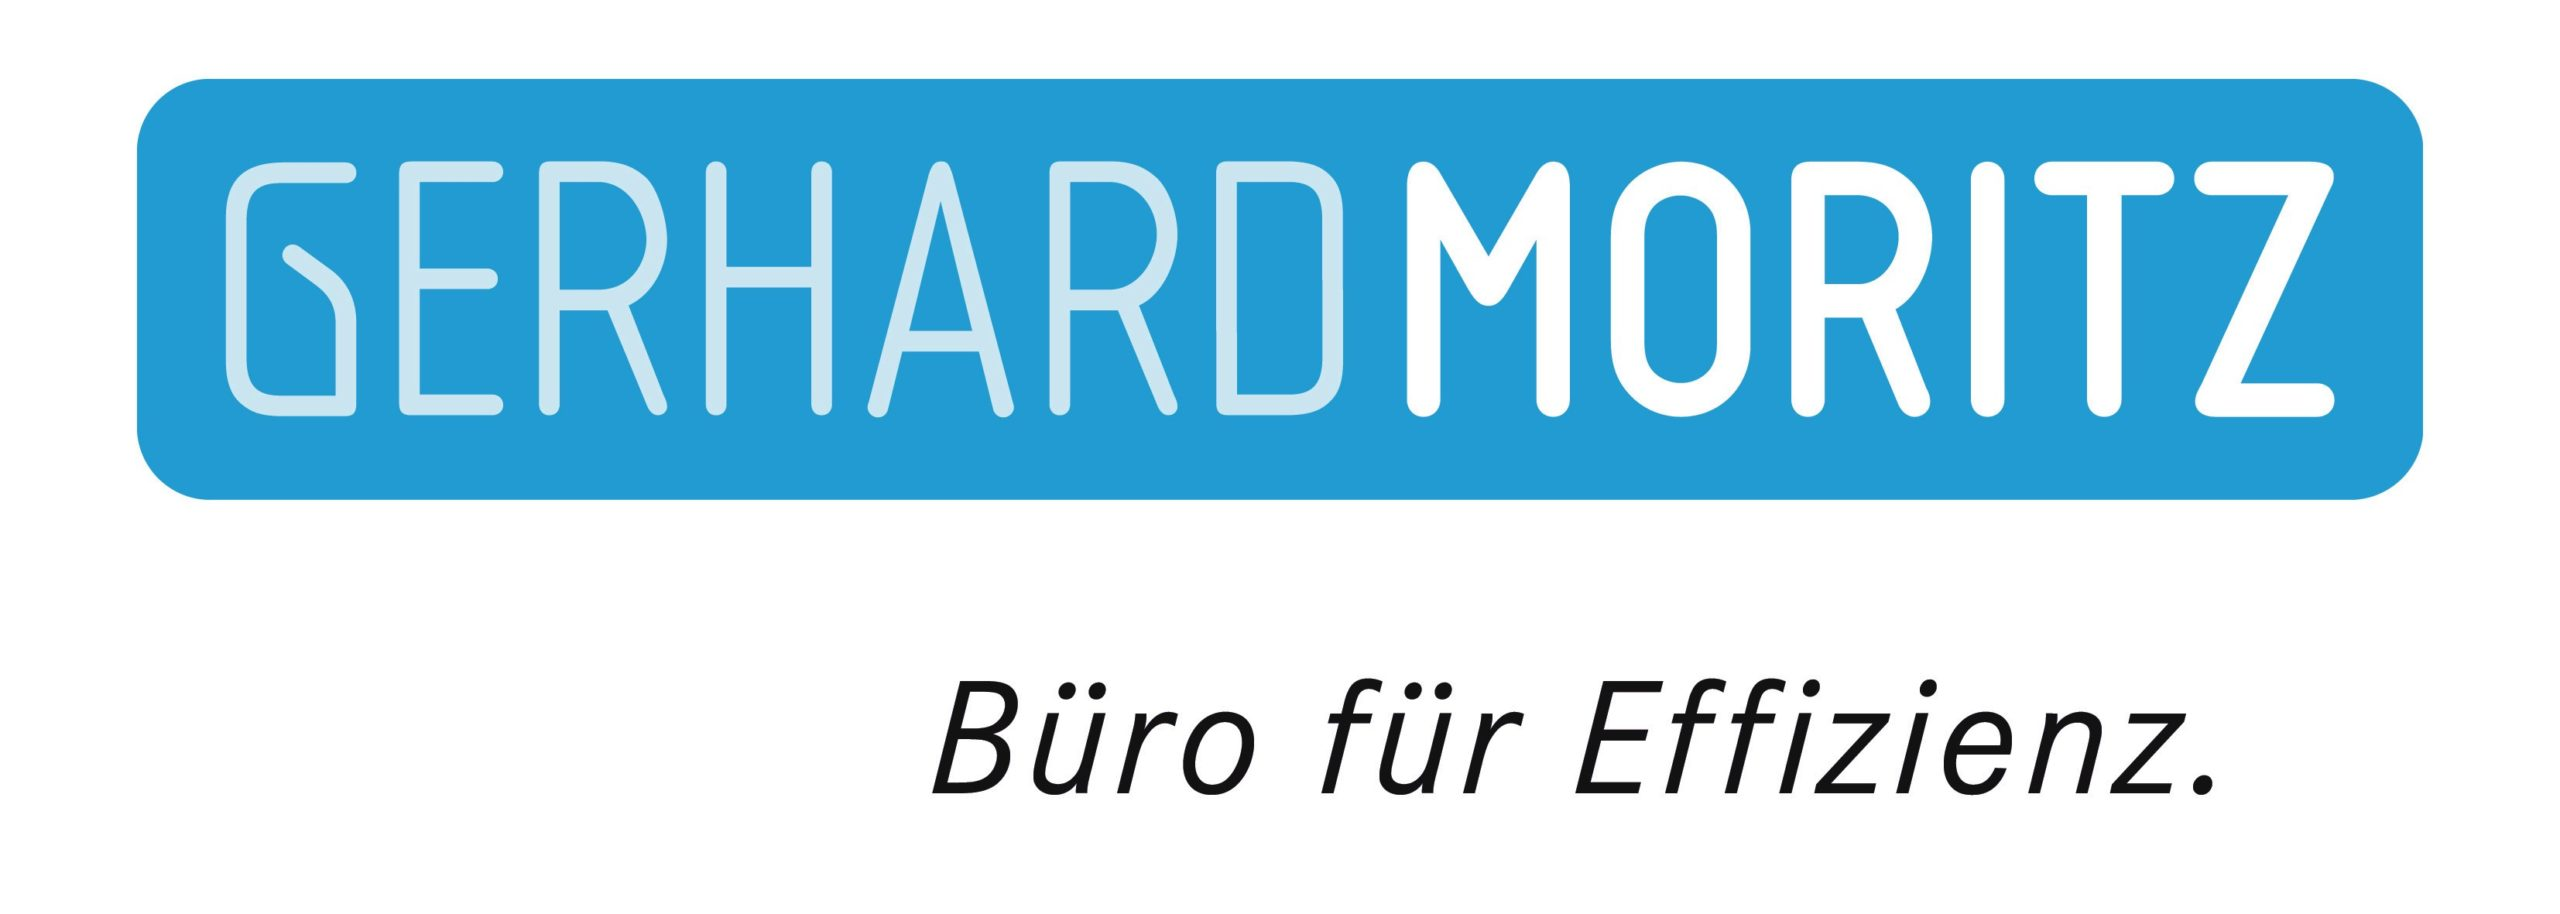 GERHARD MORITZ BÜRO FÜR EFFIZIENZ